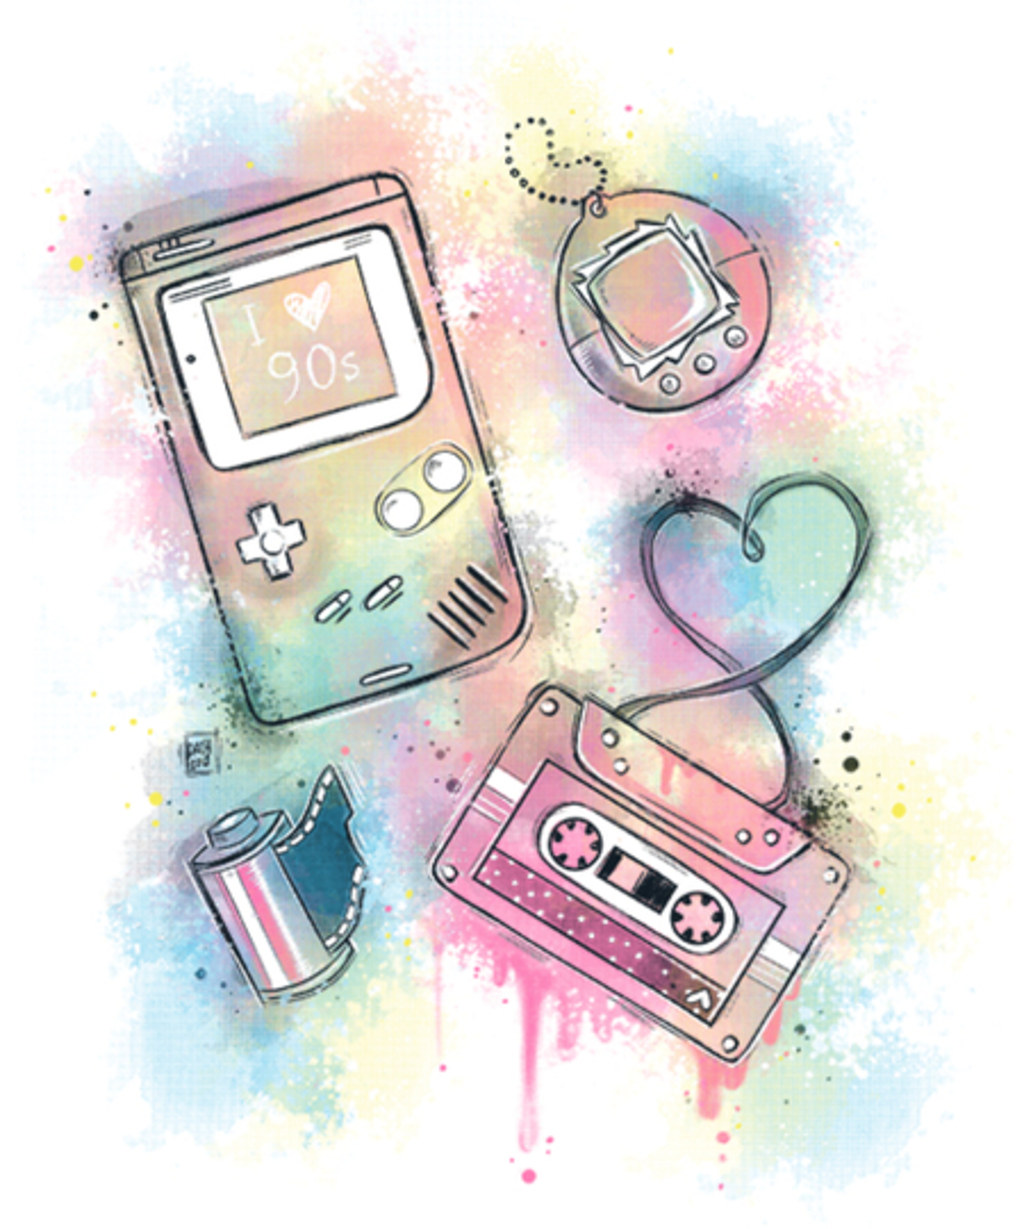 Qwertee: Love 90s